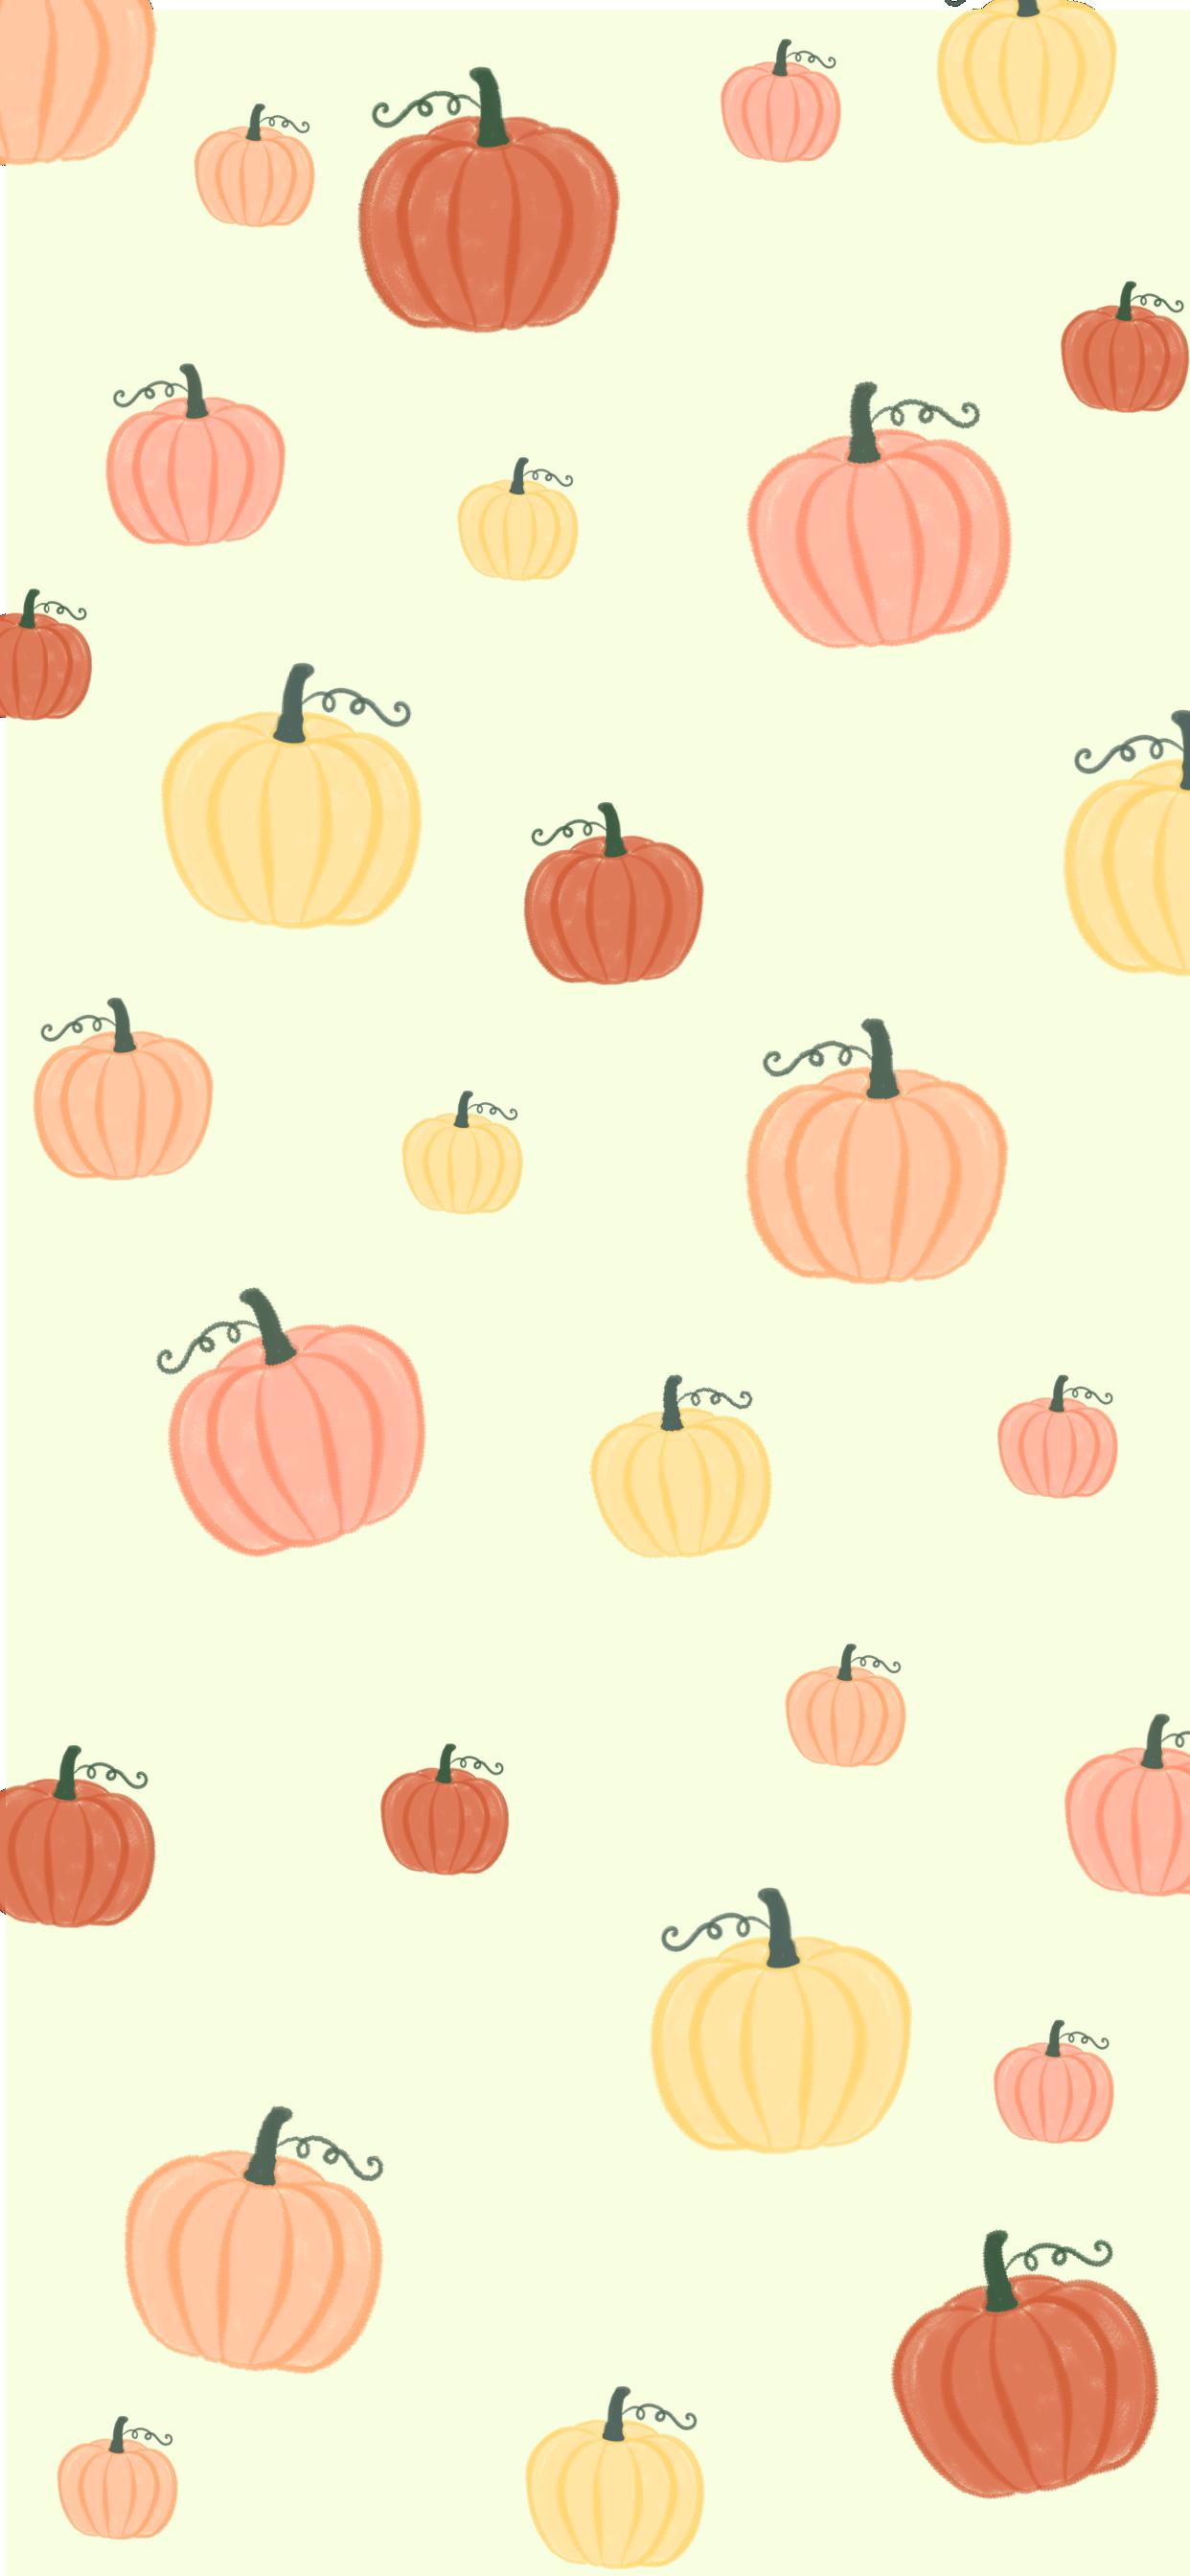 Free Fall Iphone Wallpapers Pumpkins Iphone Wallpaper Fall Watercolor Wallpaper Iphone Cute Fall Wallpaper